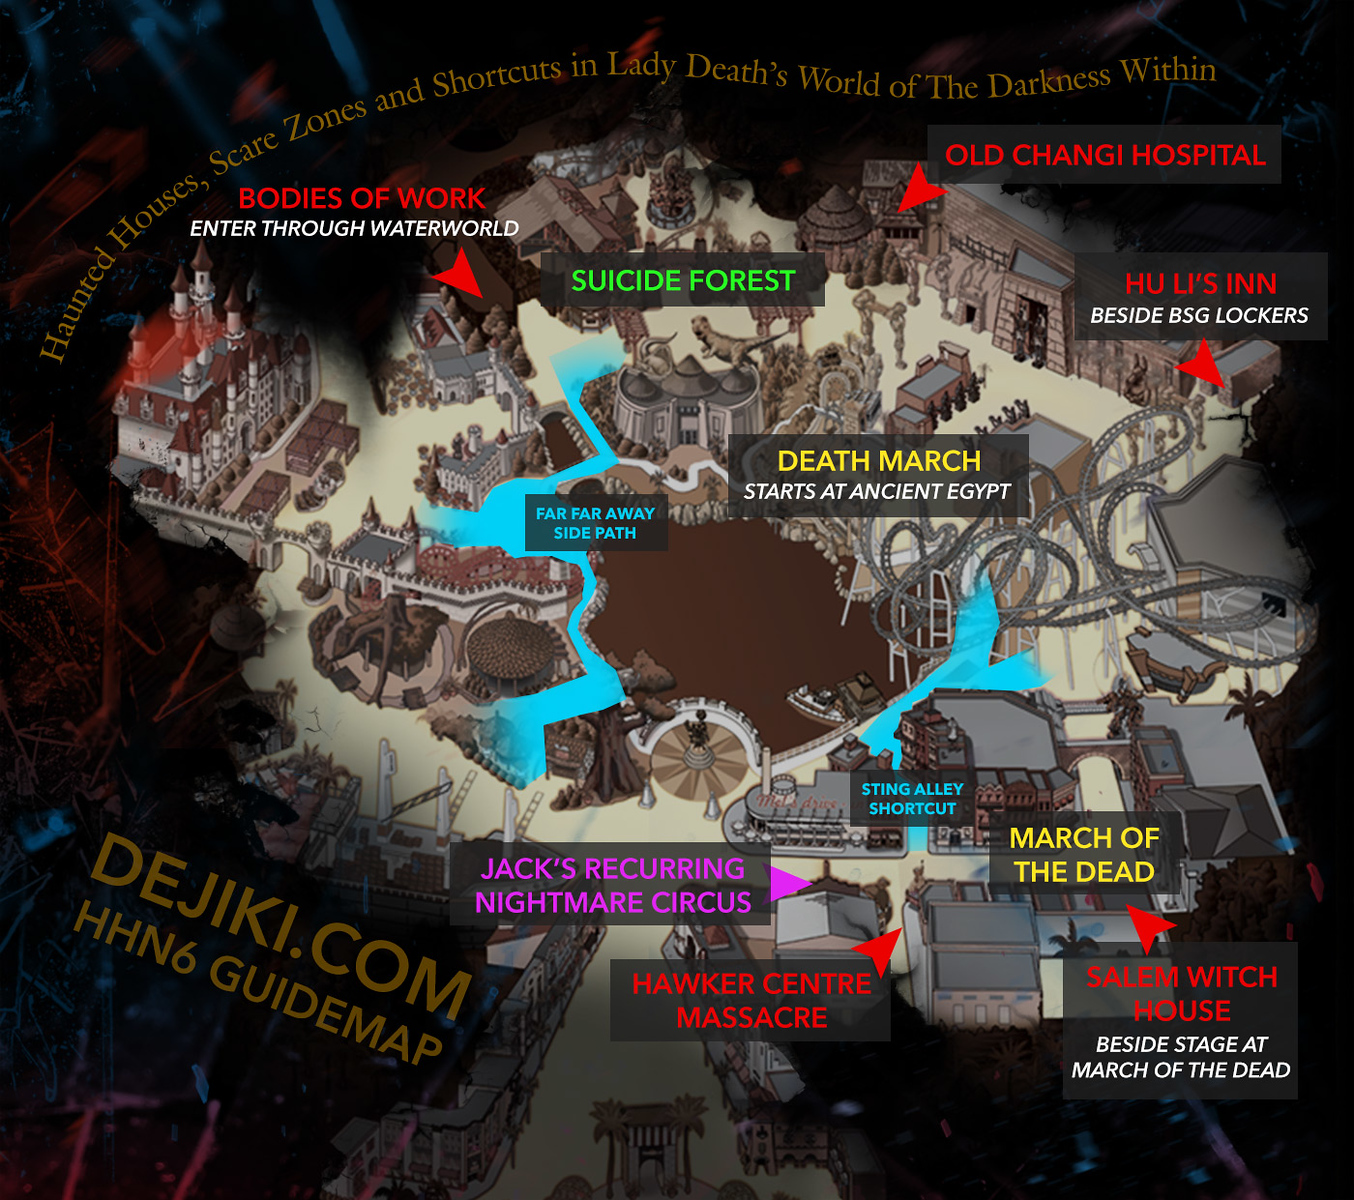 Halloween Horror Nights 6 Park Map by Dejiki.com